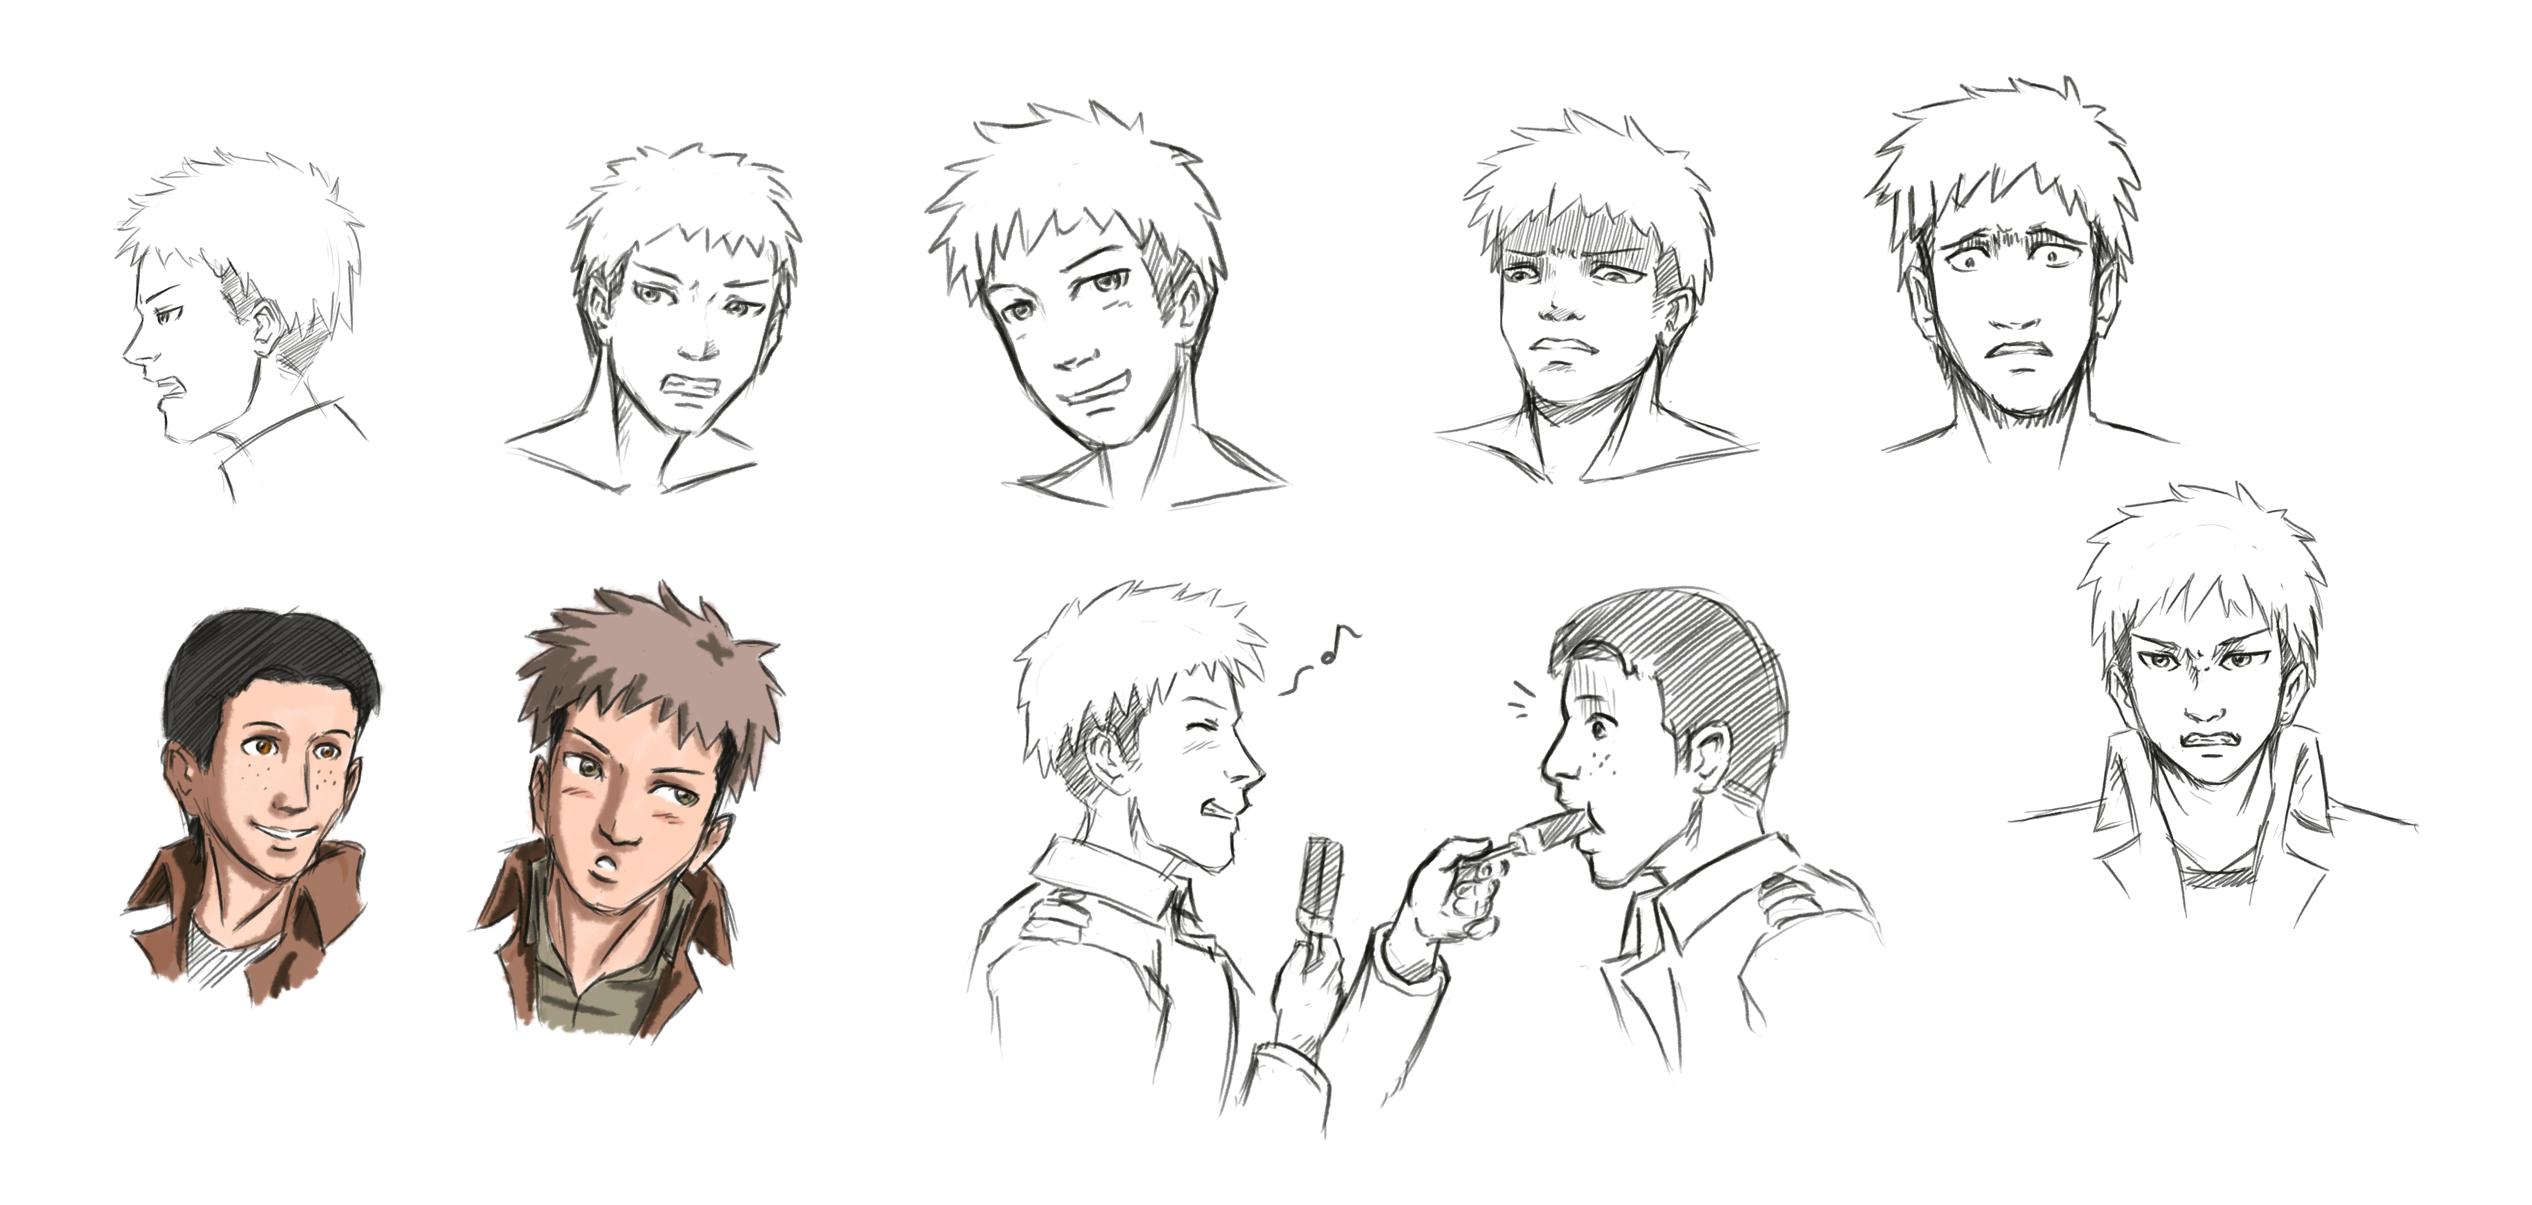 anime male face - HD2532×1205